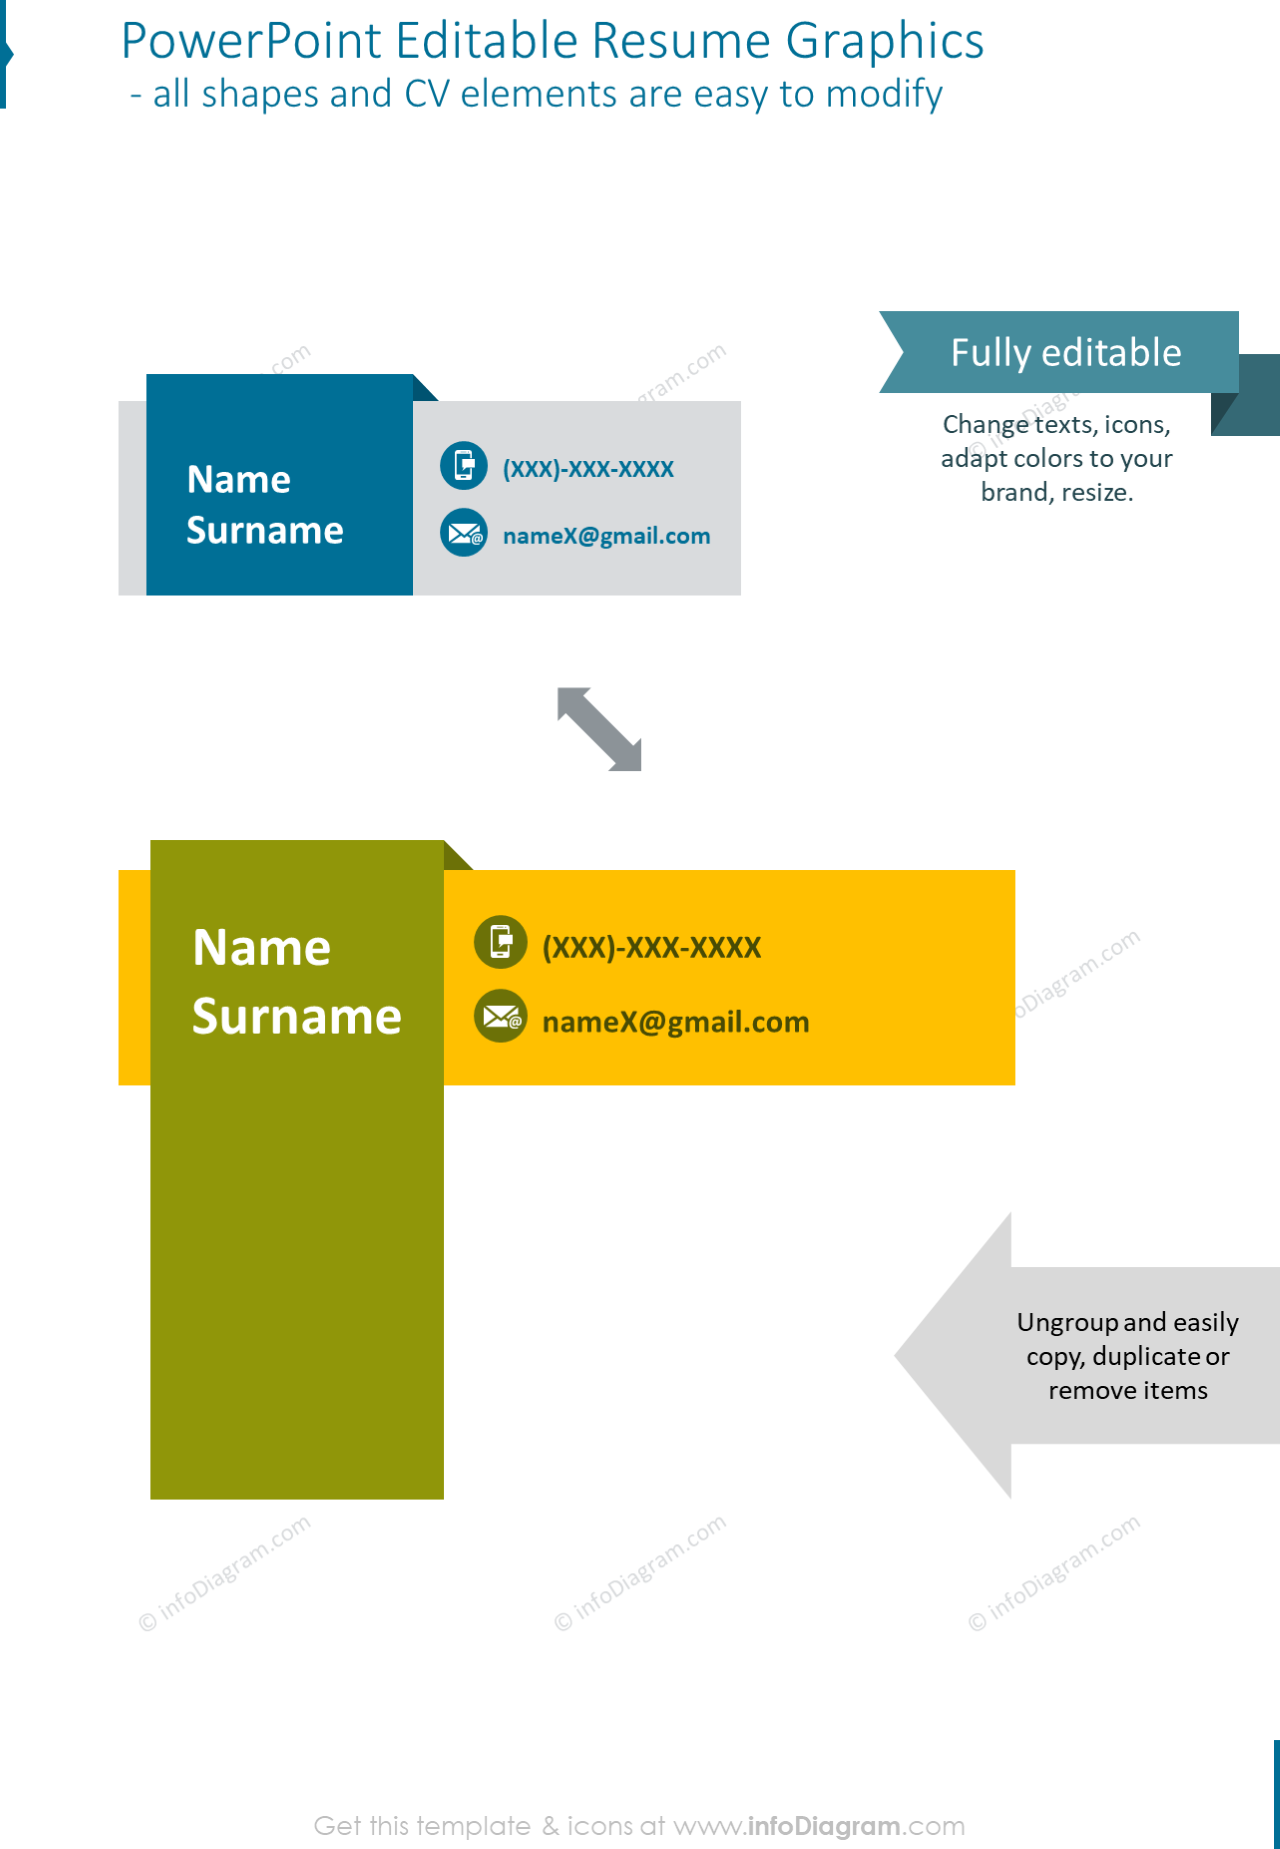 PowerPoint editable resume graphics